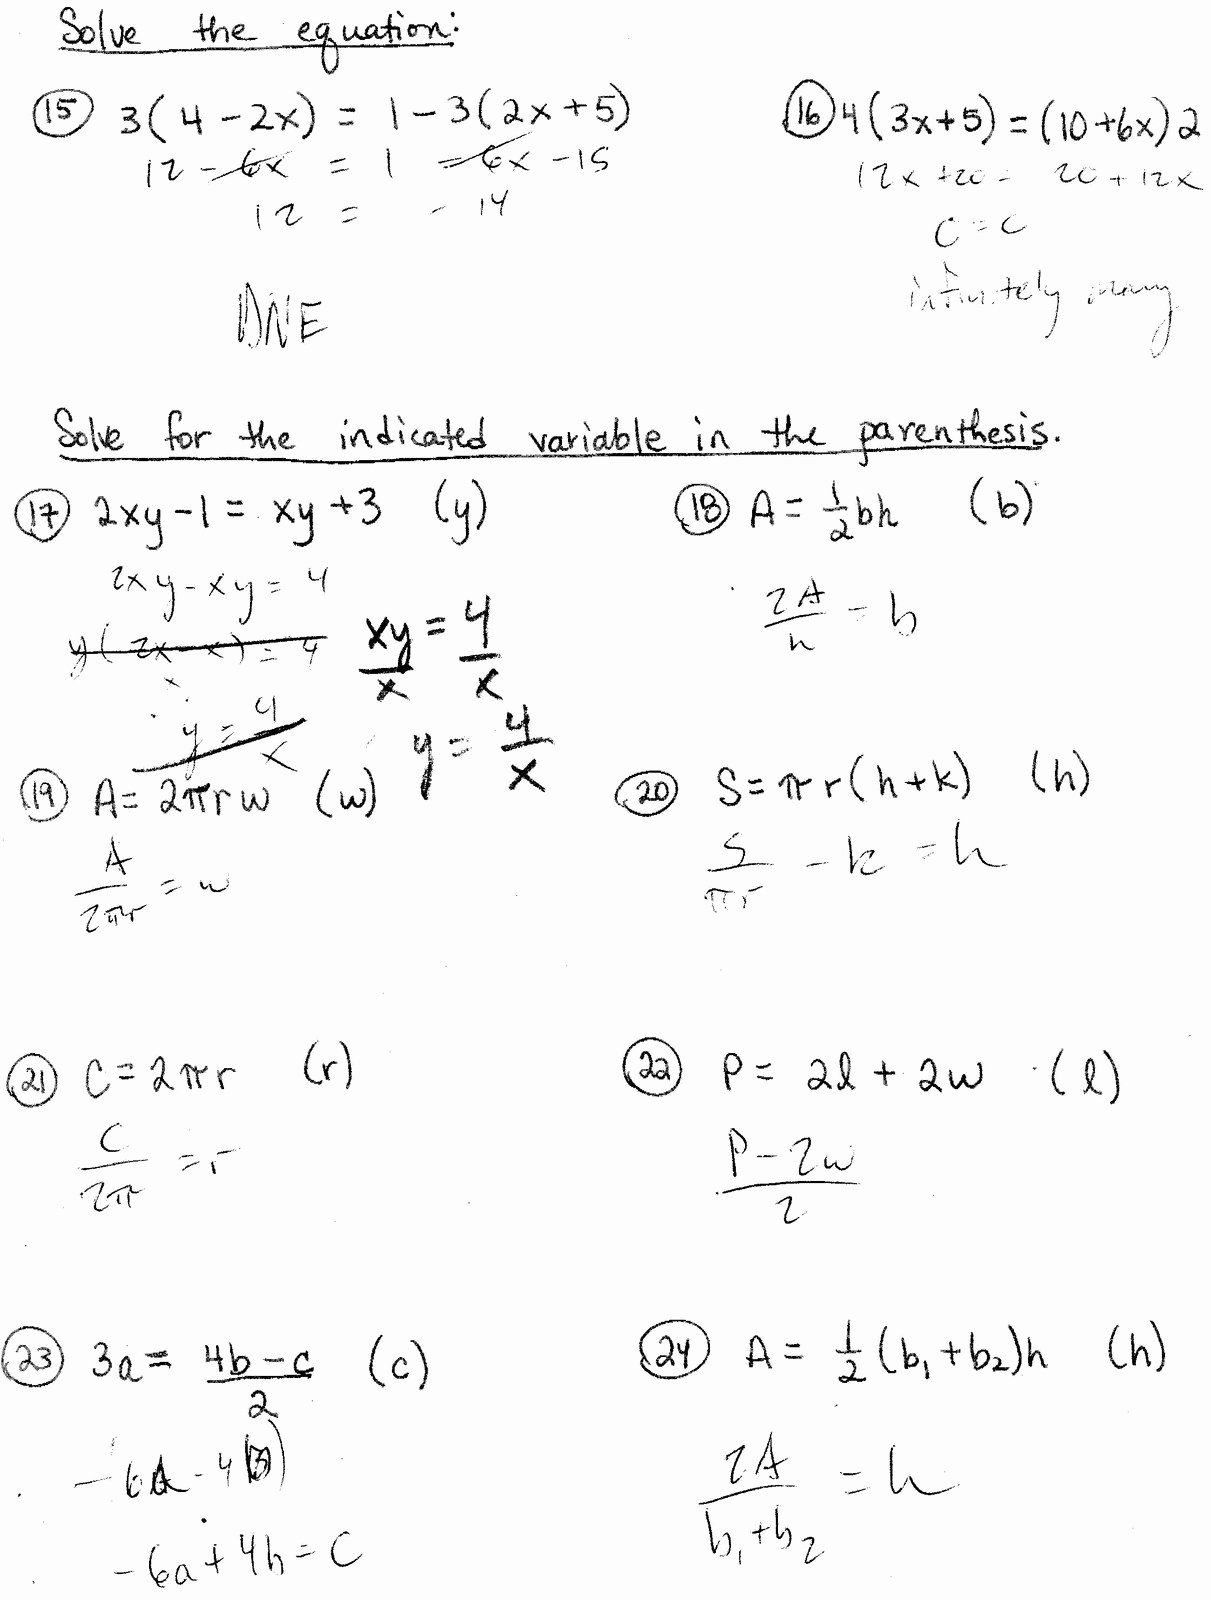 Solving Literal Equations Worksheet Luxury solving Literal Equations Students are Given Three Got It